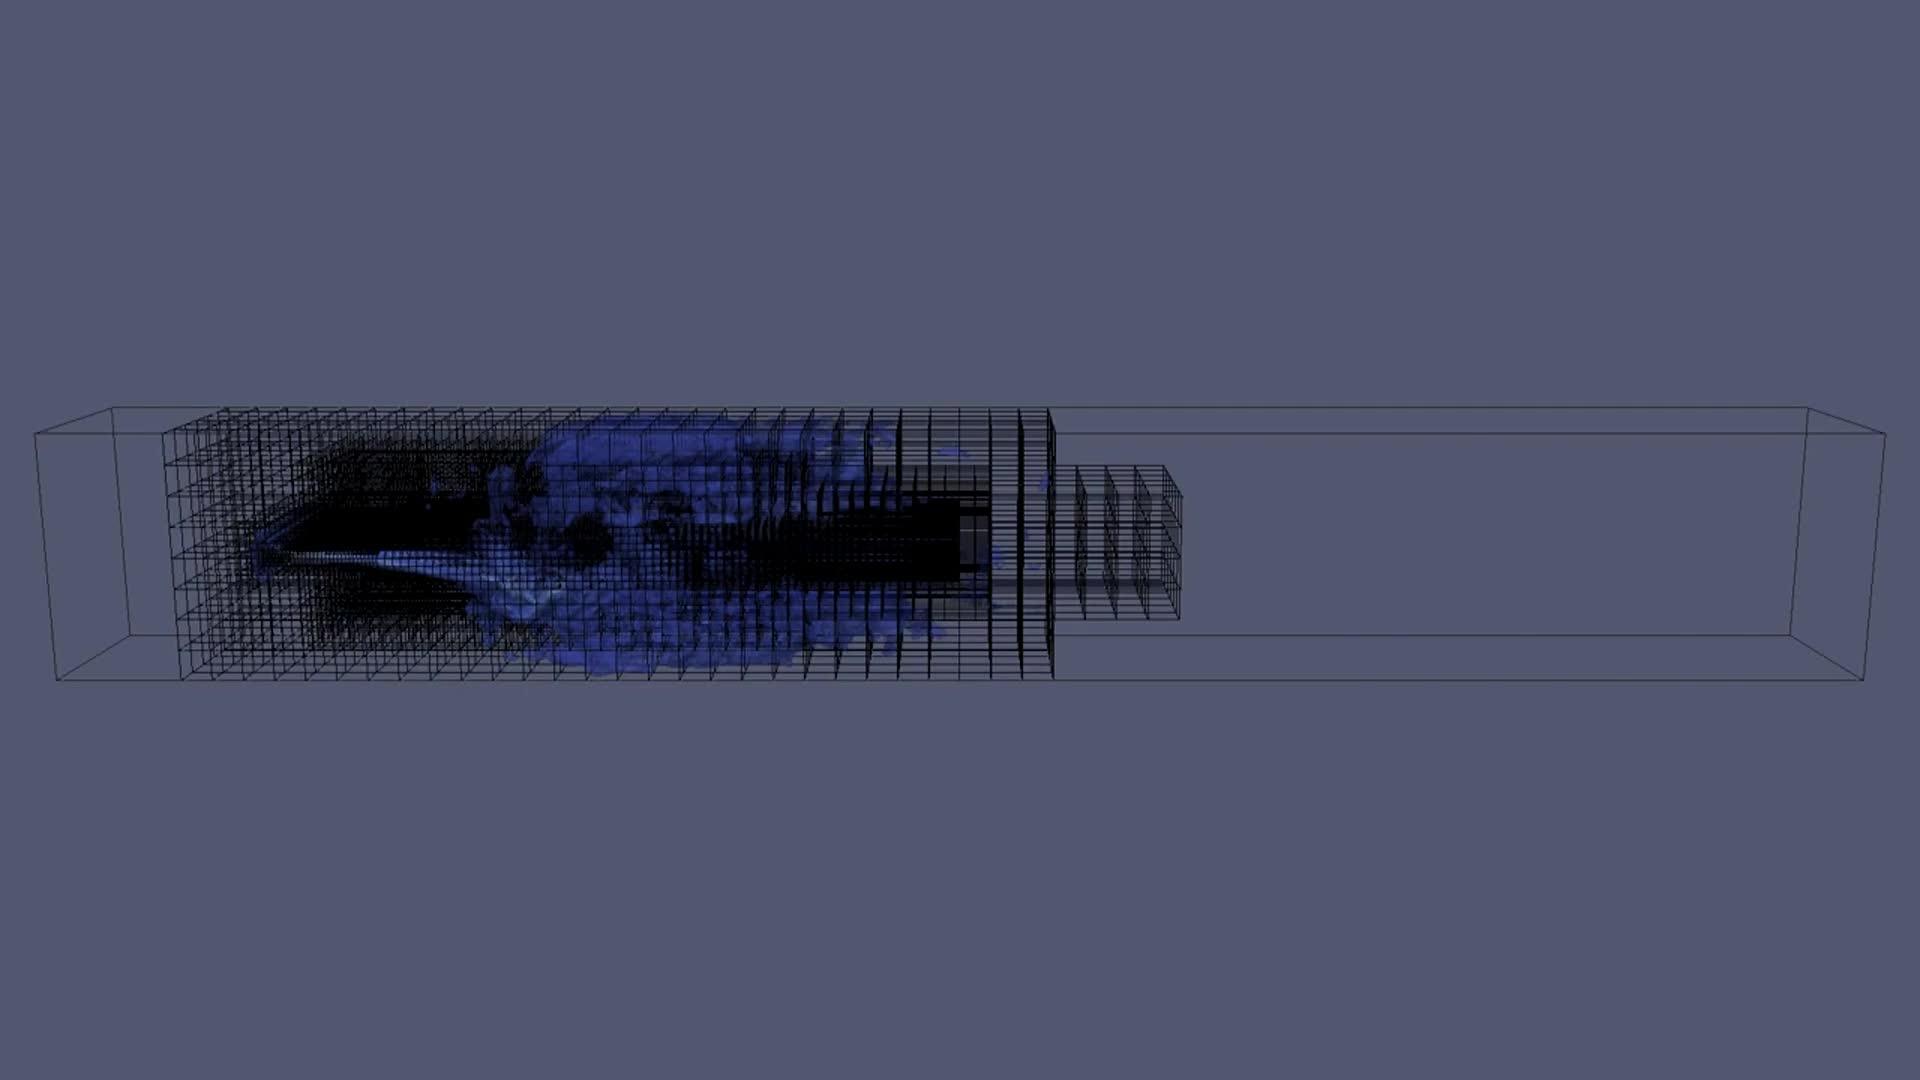 Lattice Boltzmann & Grid Refinement: A Study of the Vocal Fold preview image